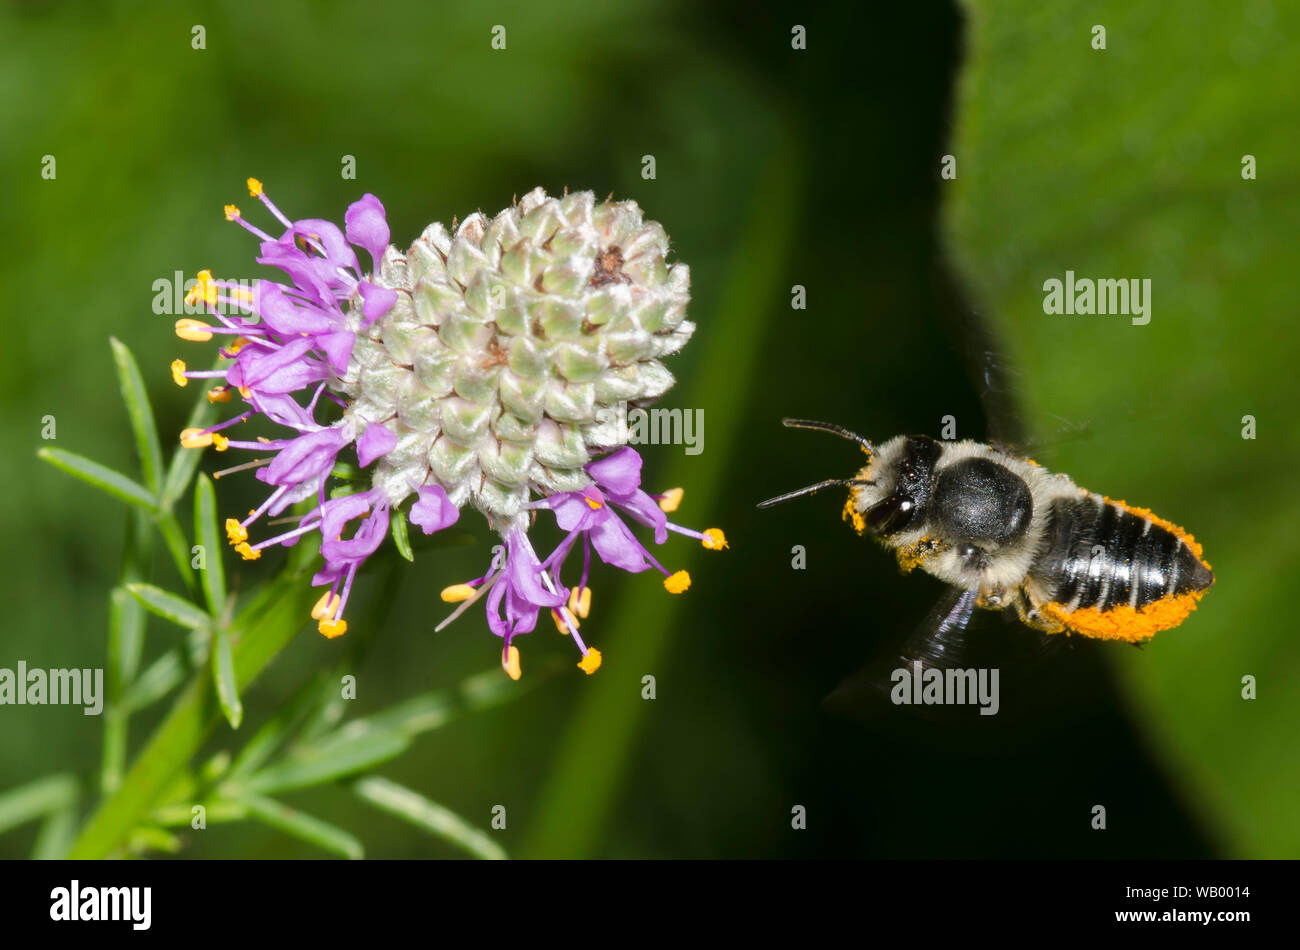 Flat-tailed Leaf-cutter Bee, Megachile mendica, hovering in flight near Purple Prairie Clover, Dalea purpurea Stock Photo